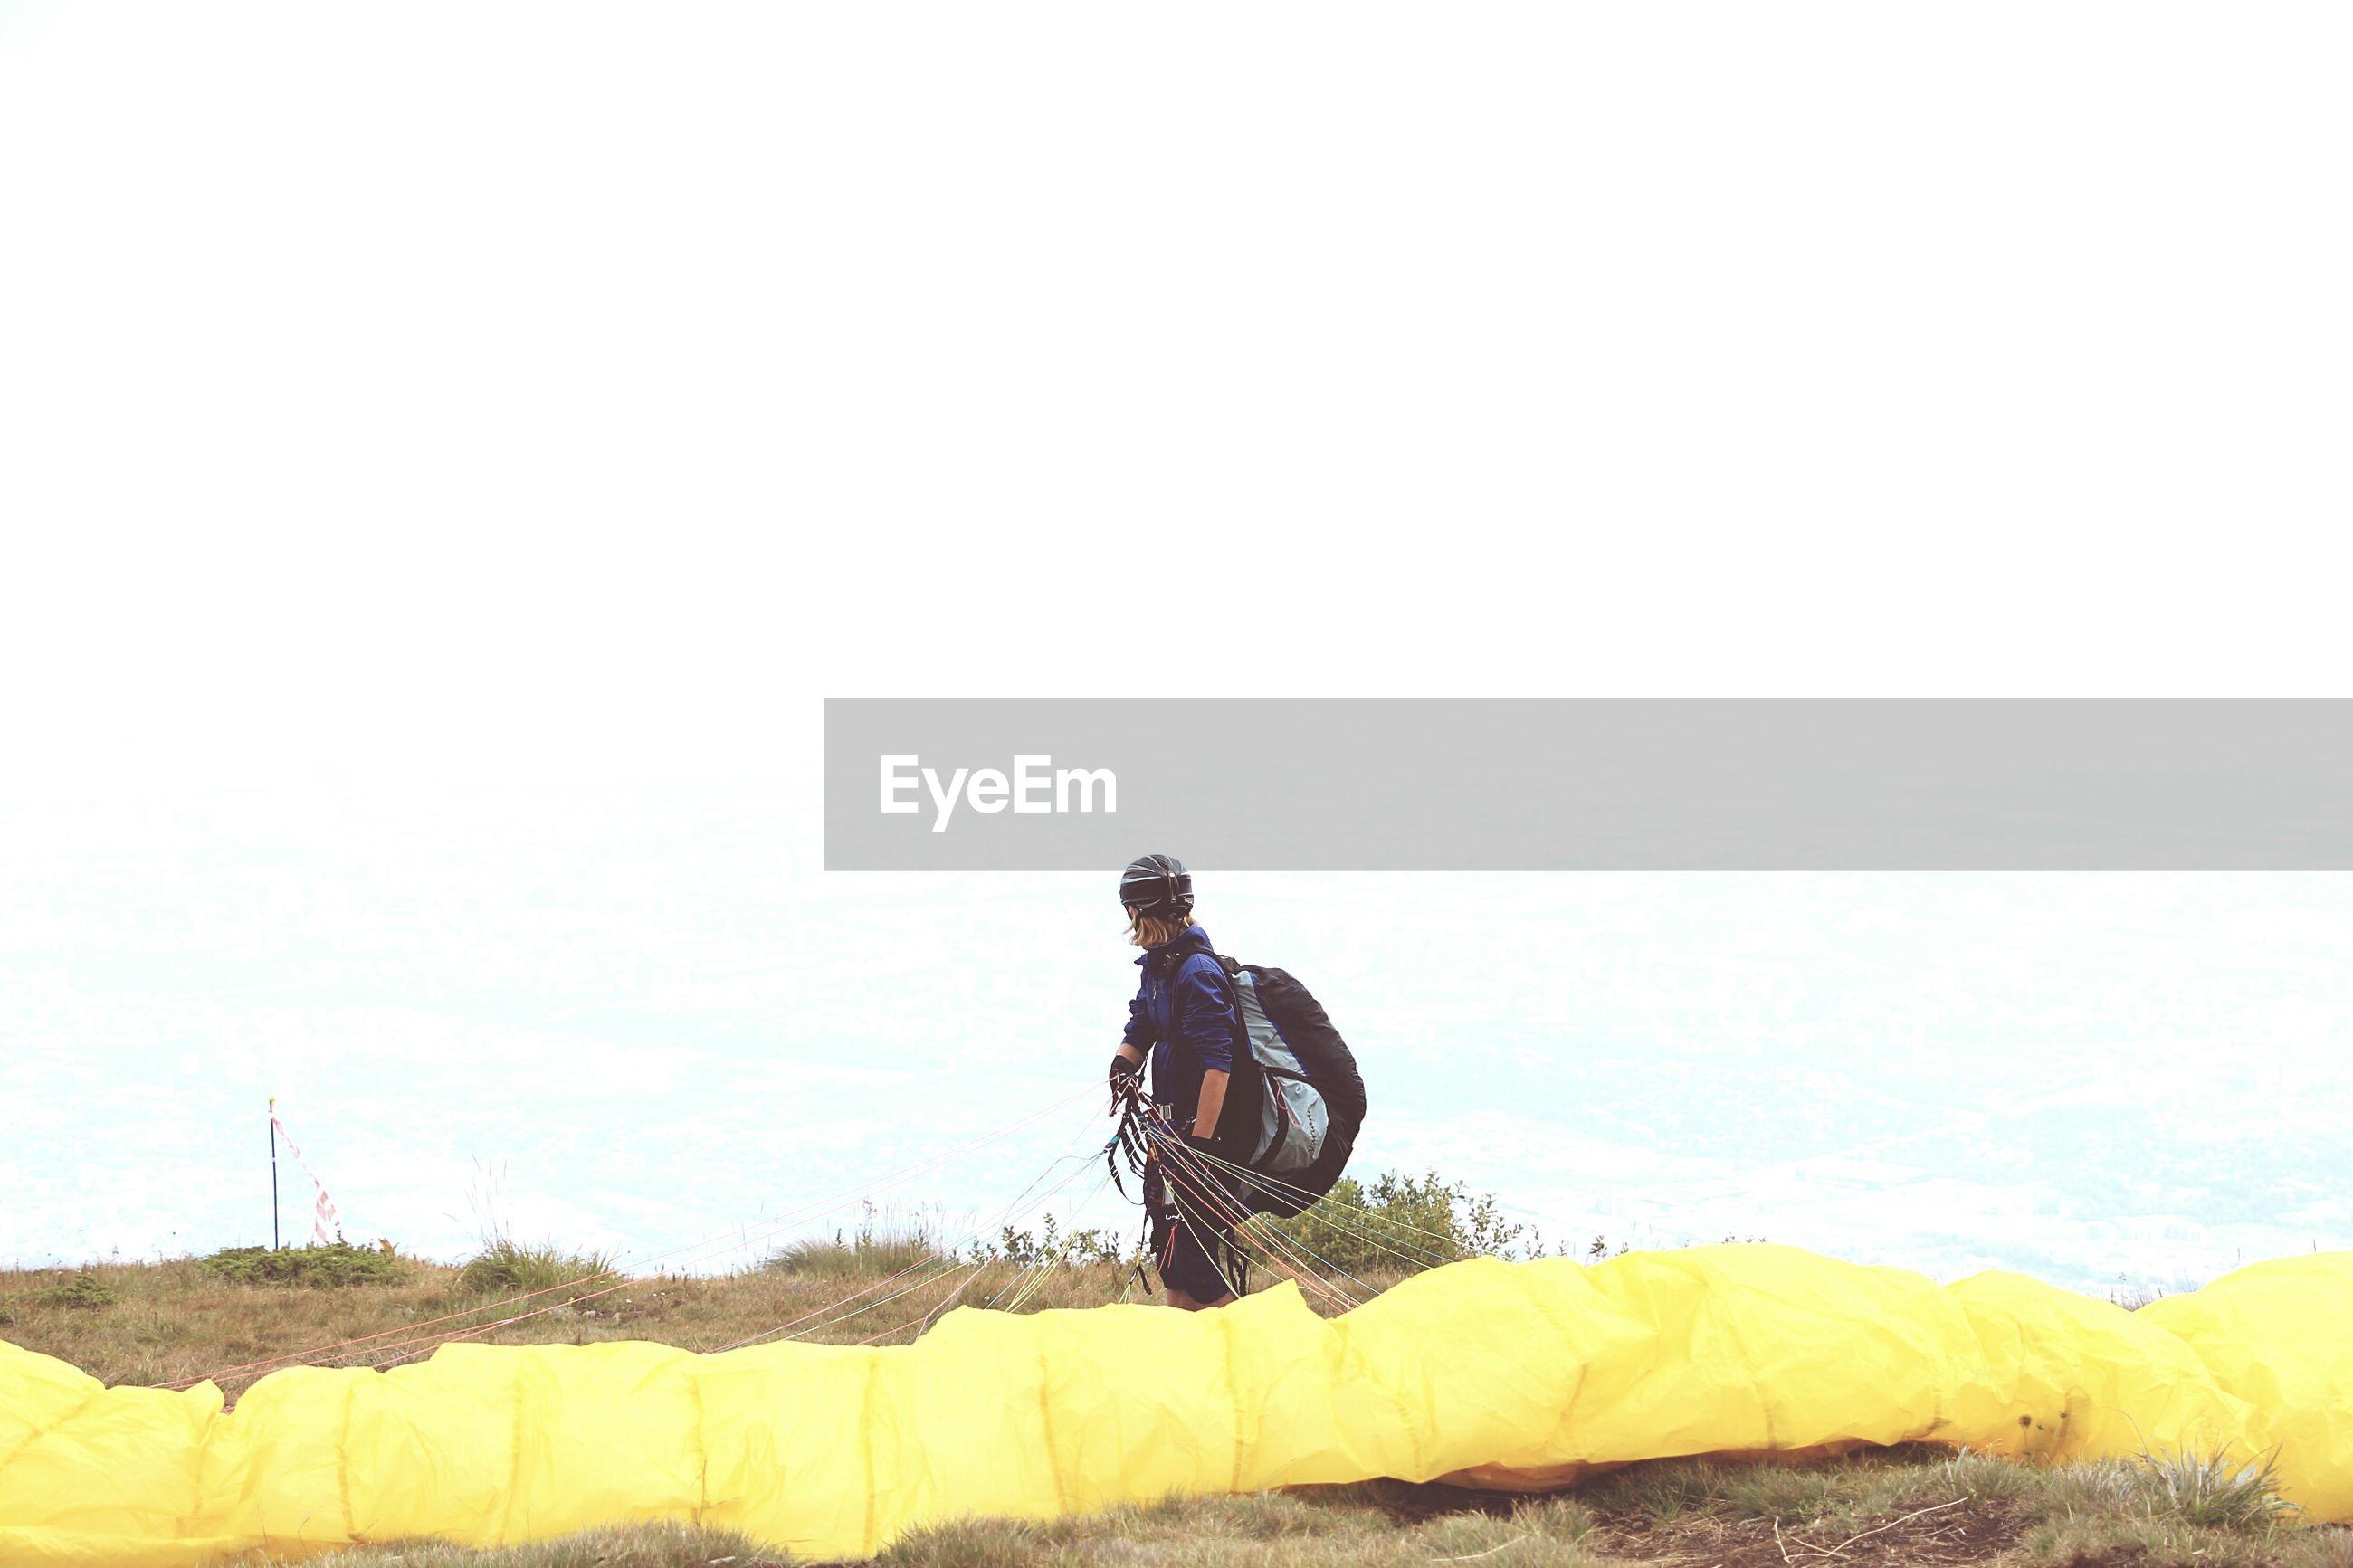 Paraglider preparing for gliding